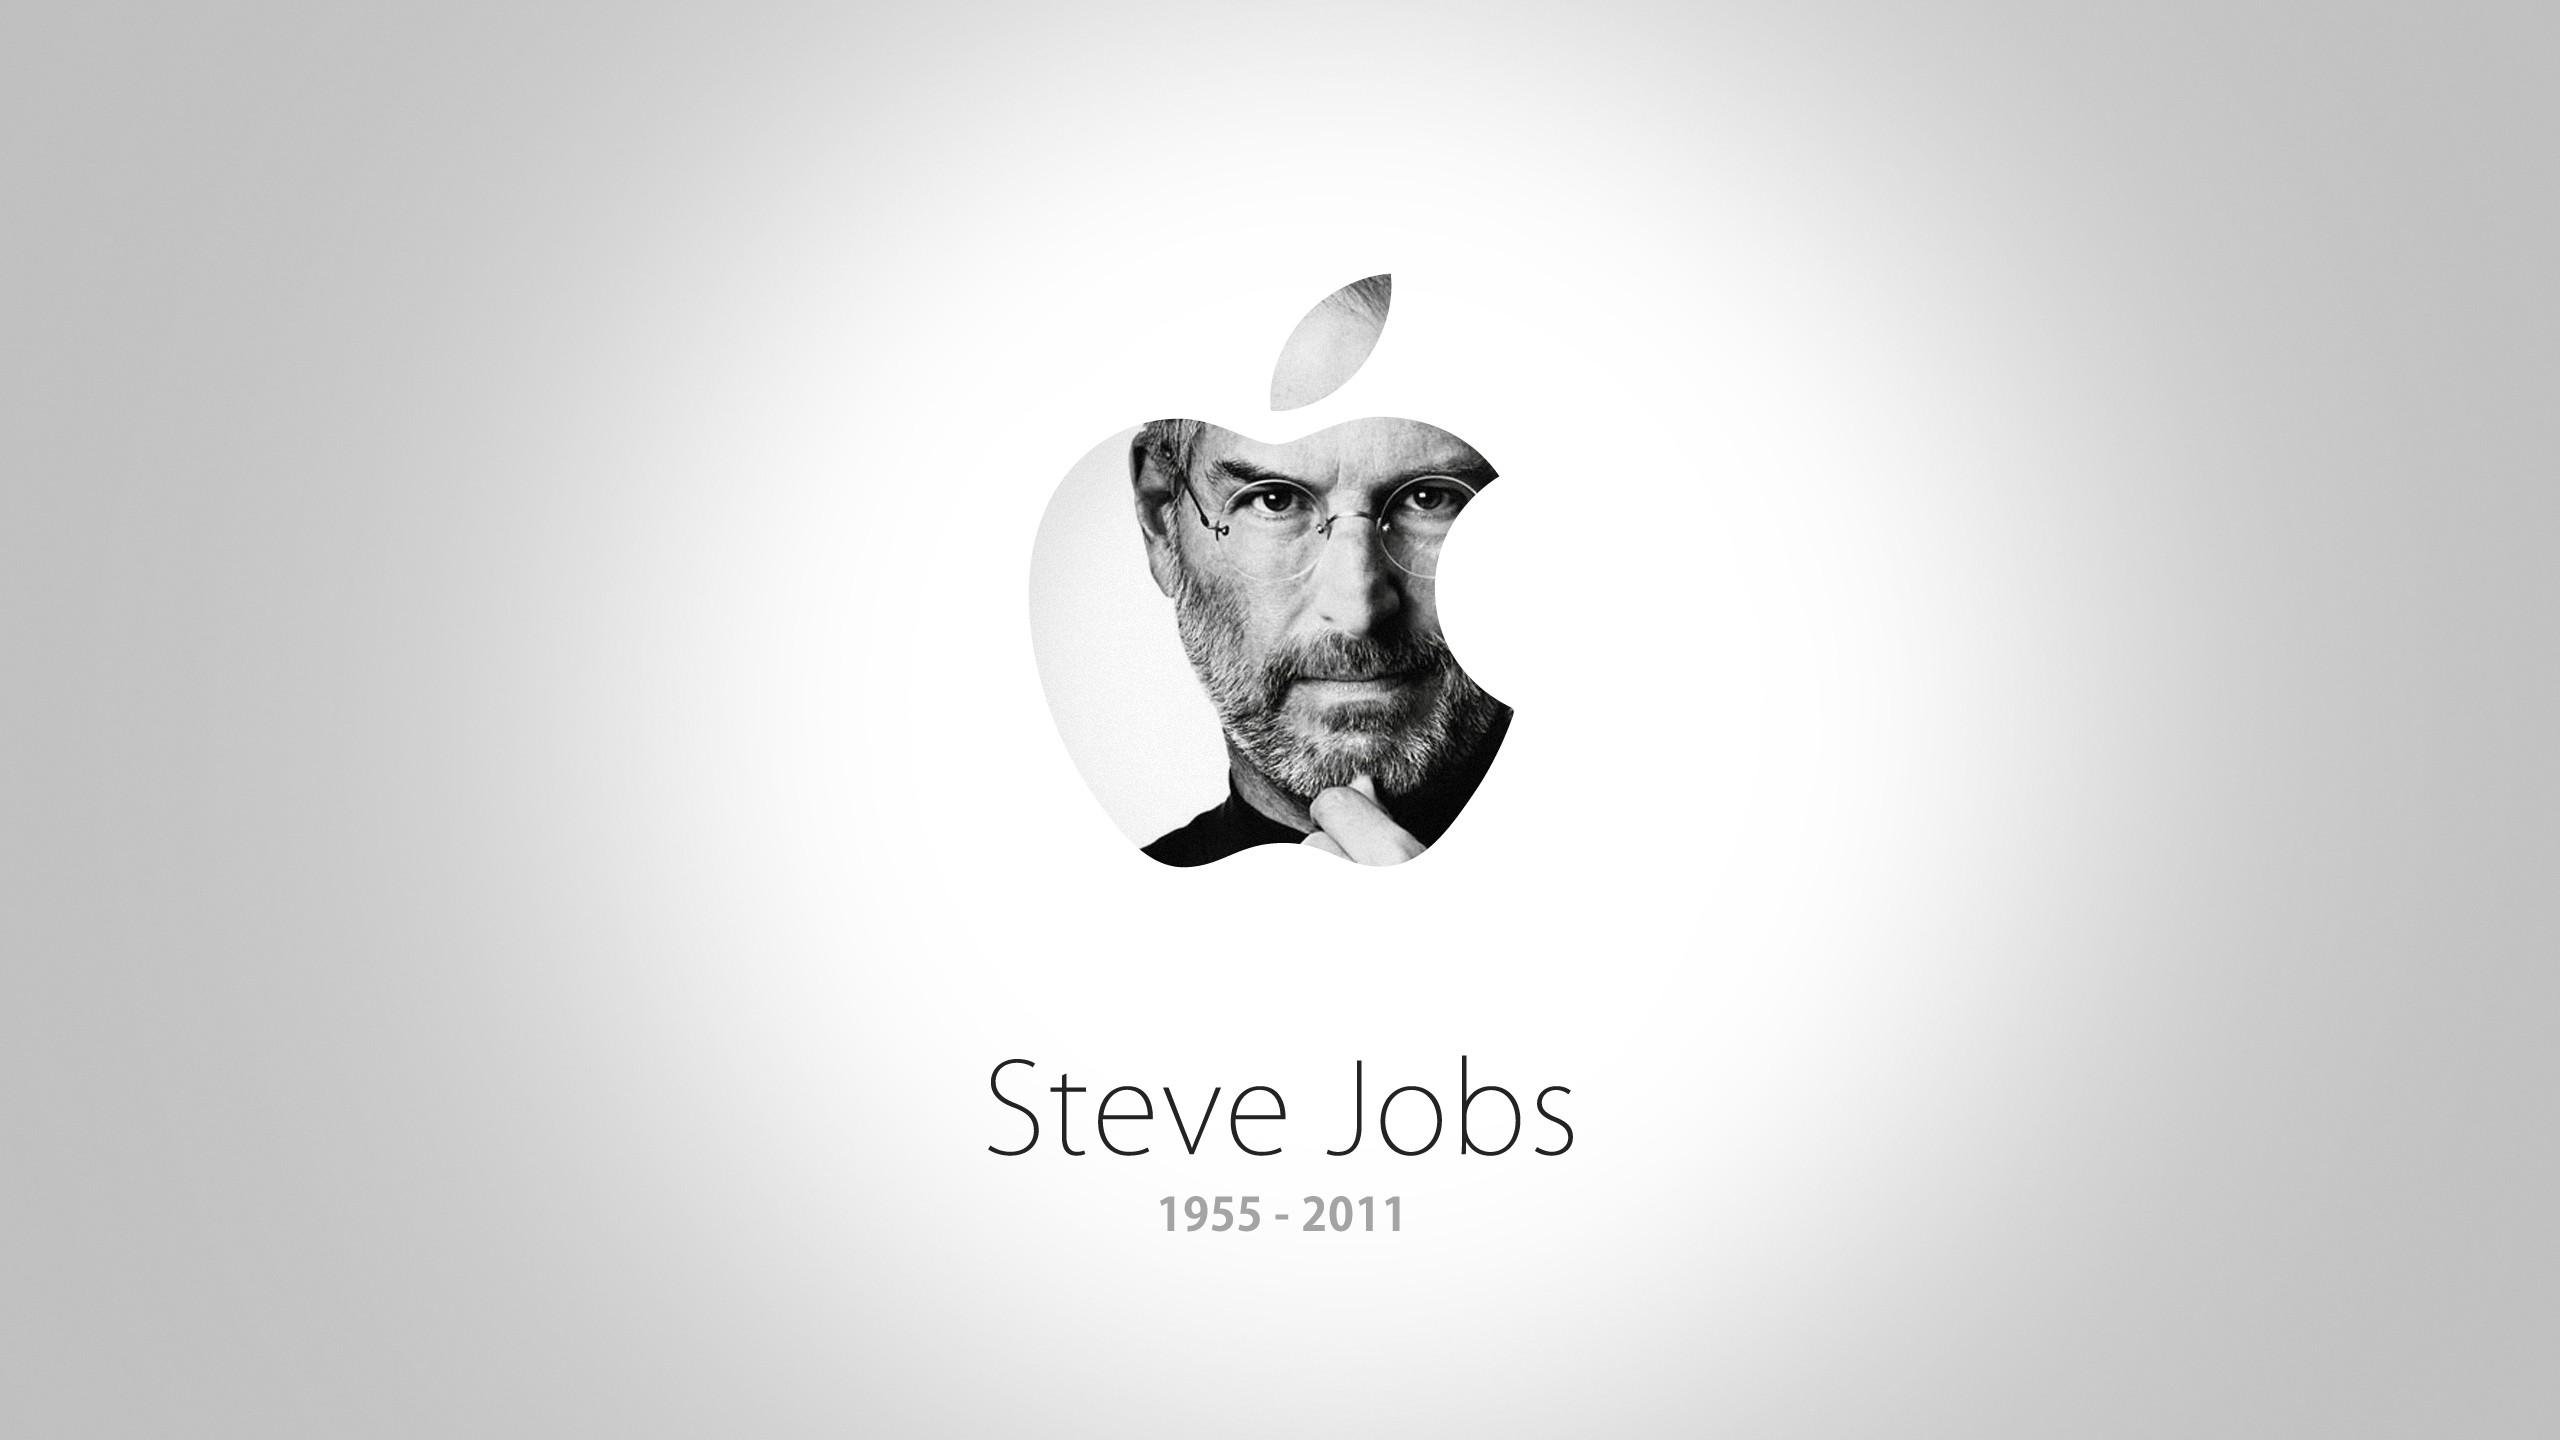 steve-jobs-apple-homage-wallpapers_35228_2560x1440